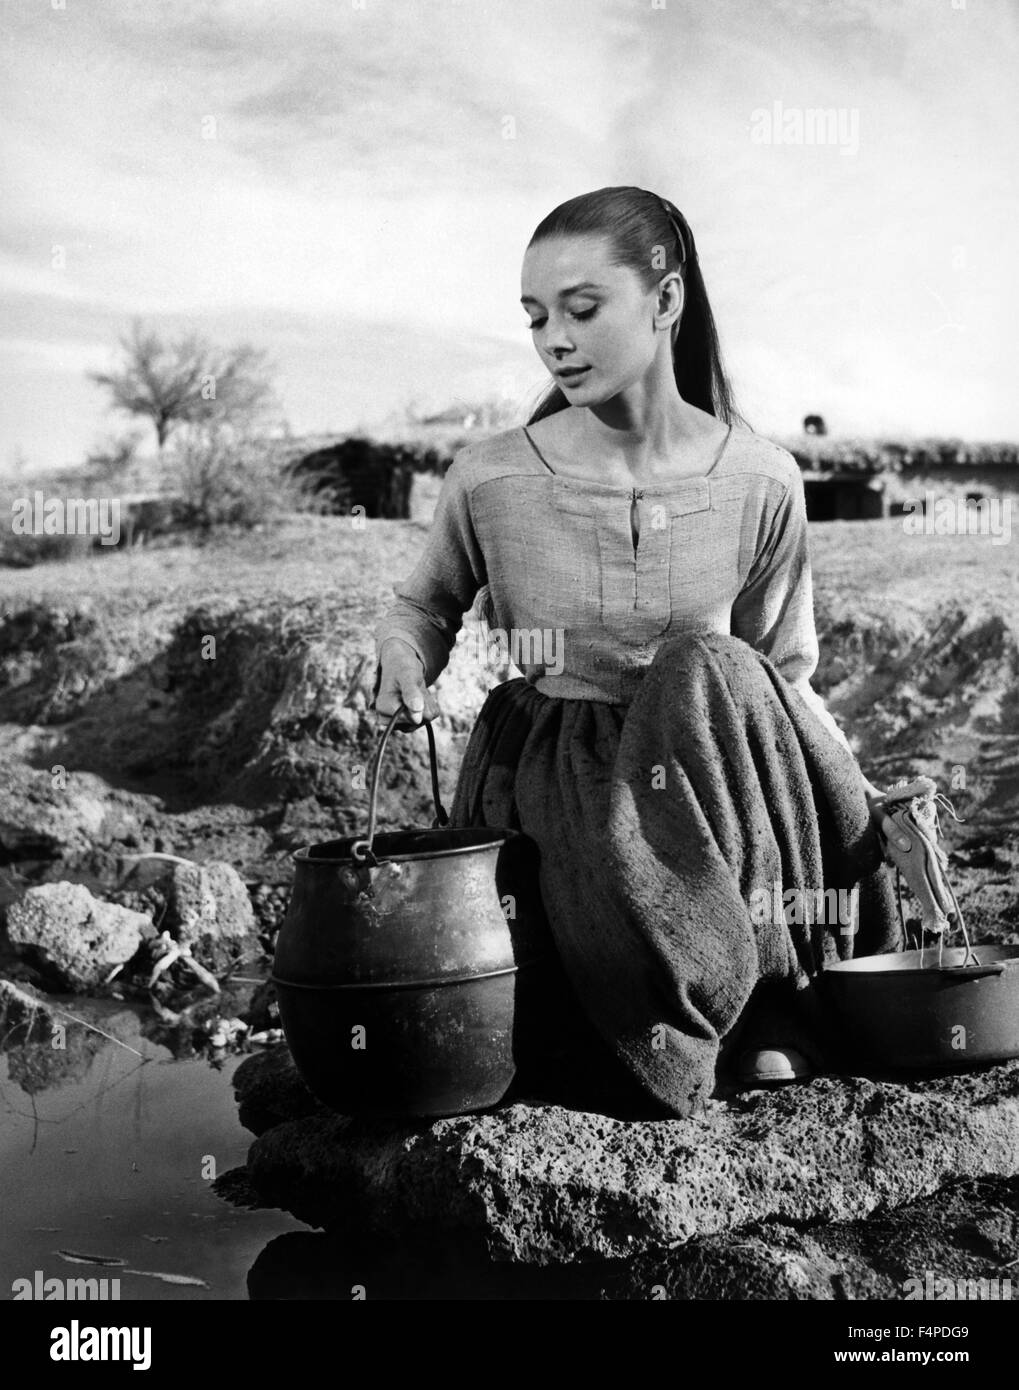 Audrey Hepburn / Unforgiven 1960 directed by John Huston - Stock Image